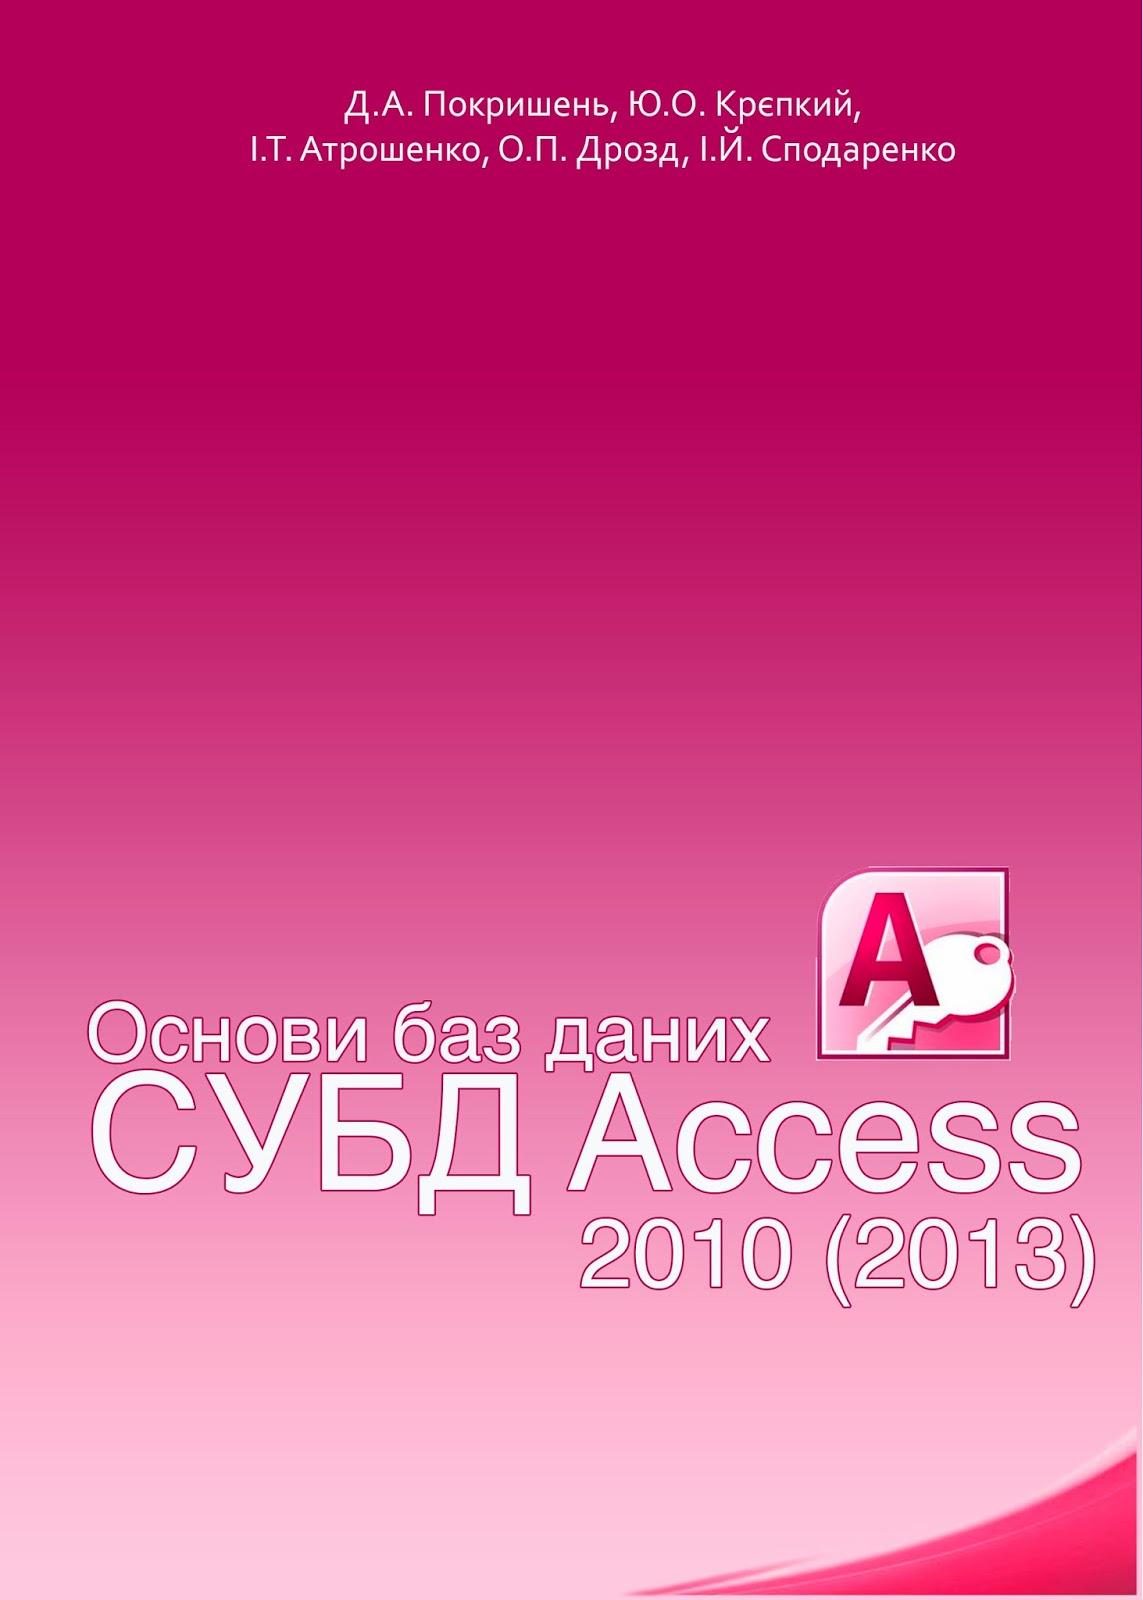 Посібник Основи баз даних. СУБД Access 2010 (2013)